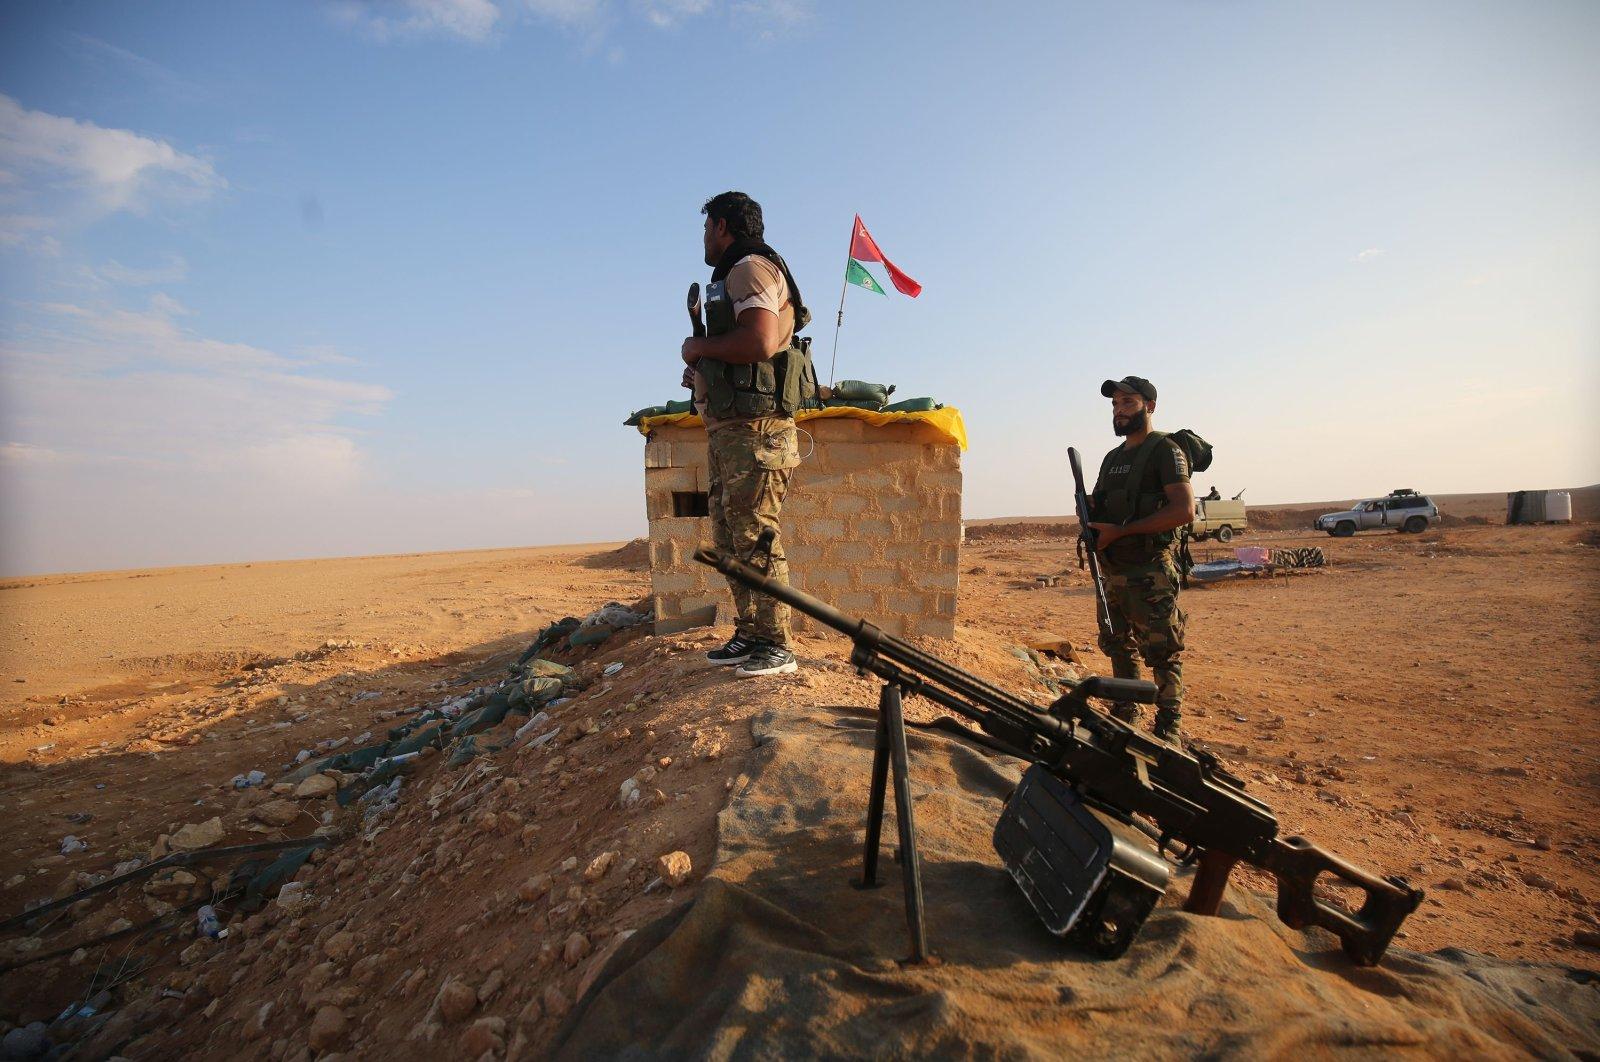 An Iraqi Shiite fighter of the Hashd al-Shaabi paramilitary force secures the border opposite Abu Kamal in Syria's Deir Ezzor region, in al-Qaim, Anbar Province, Iraq, Nov. 12, 2018. (AFP Photo)